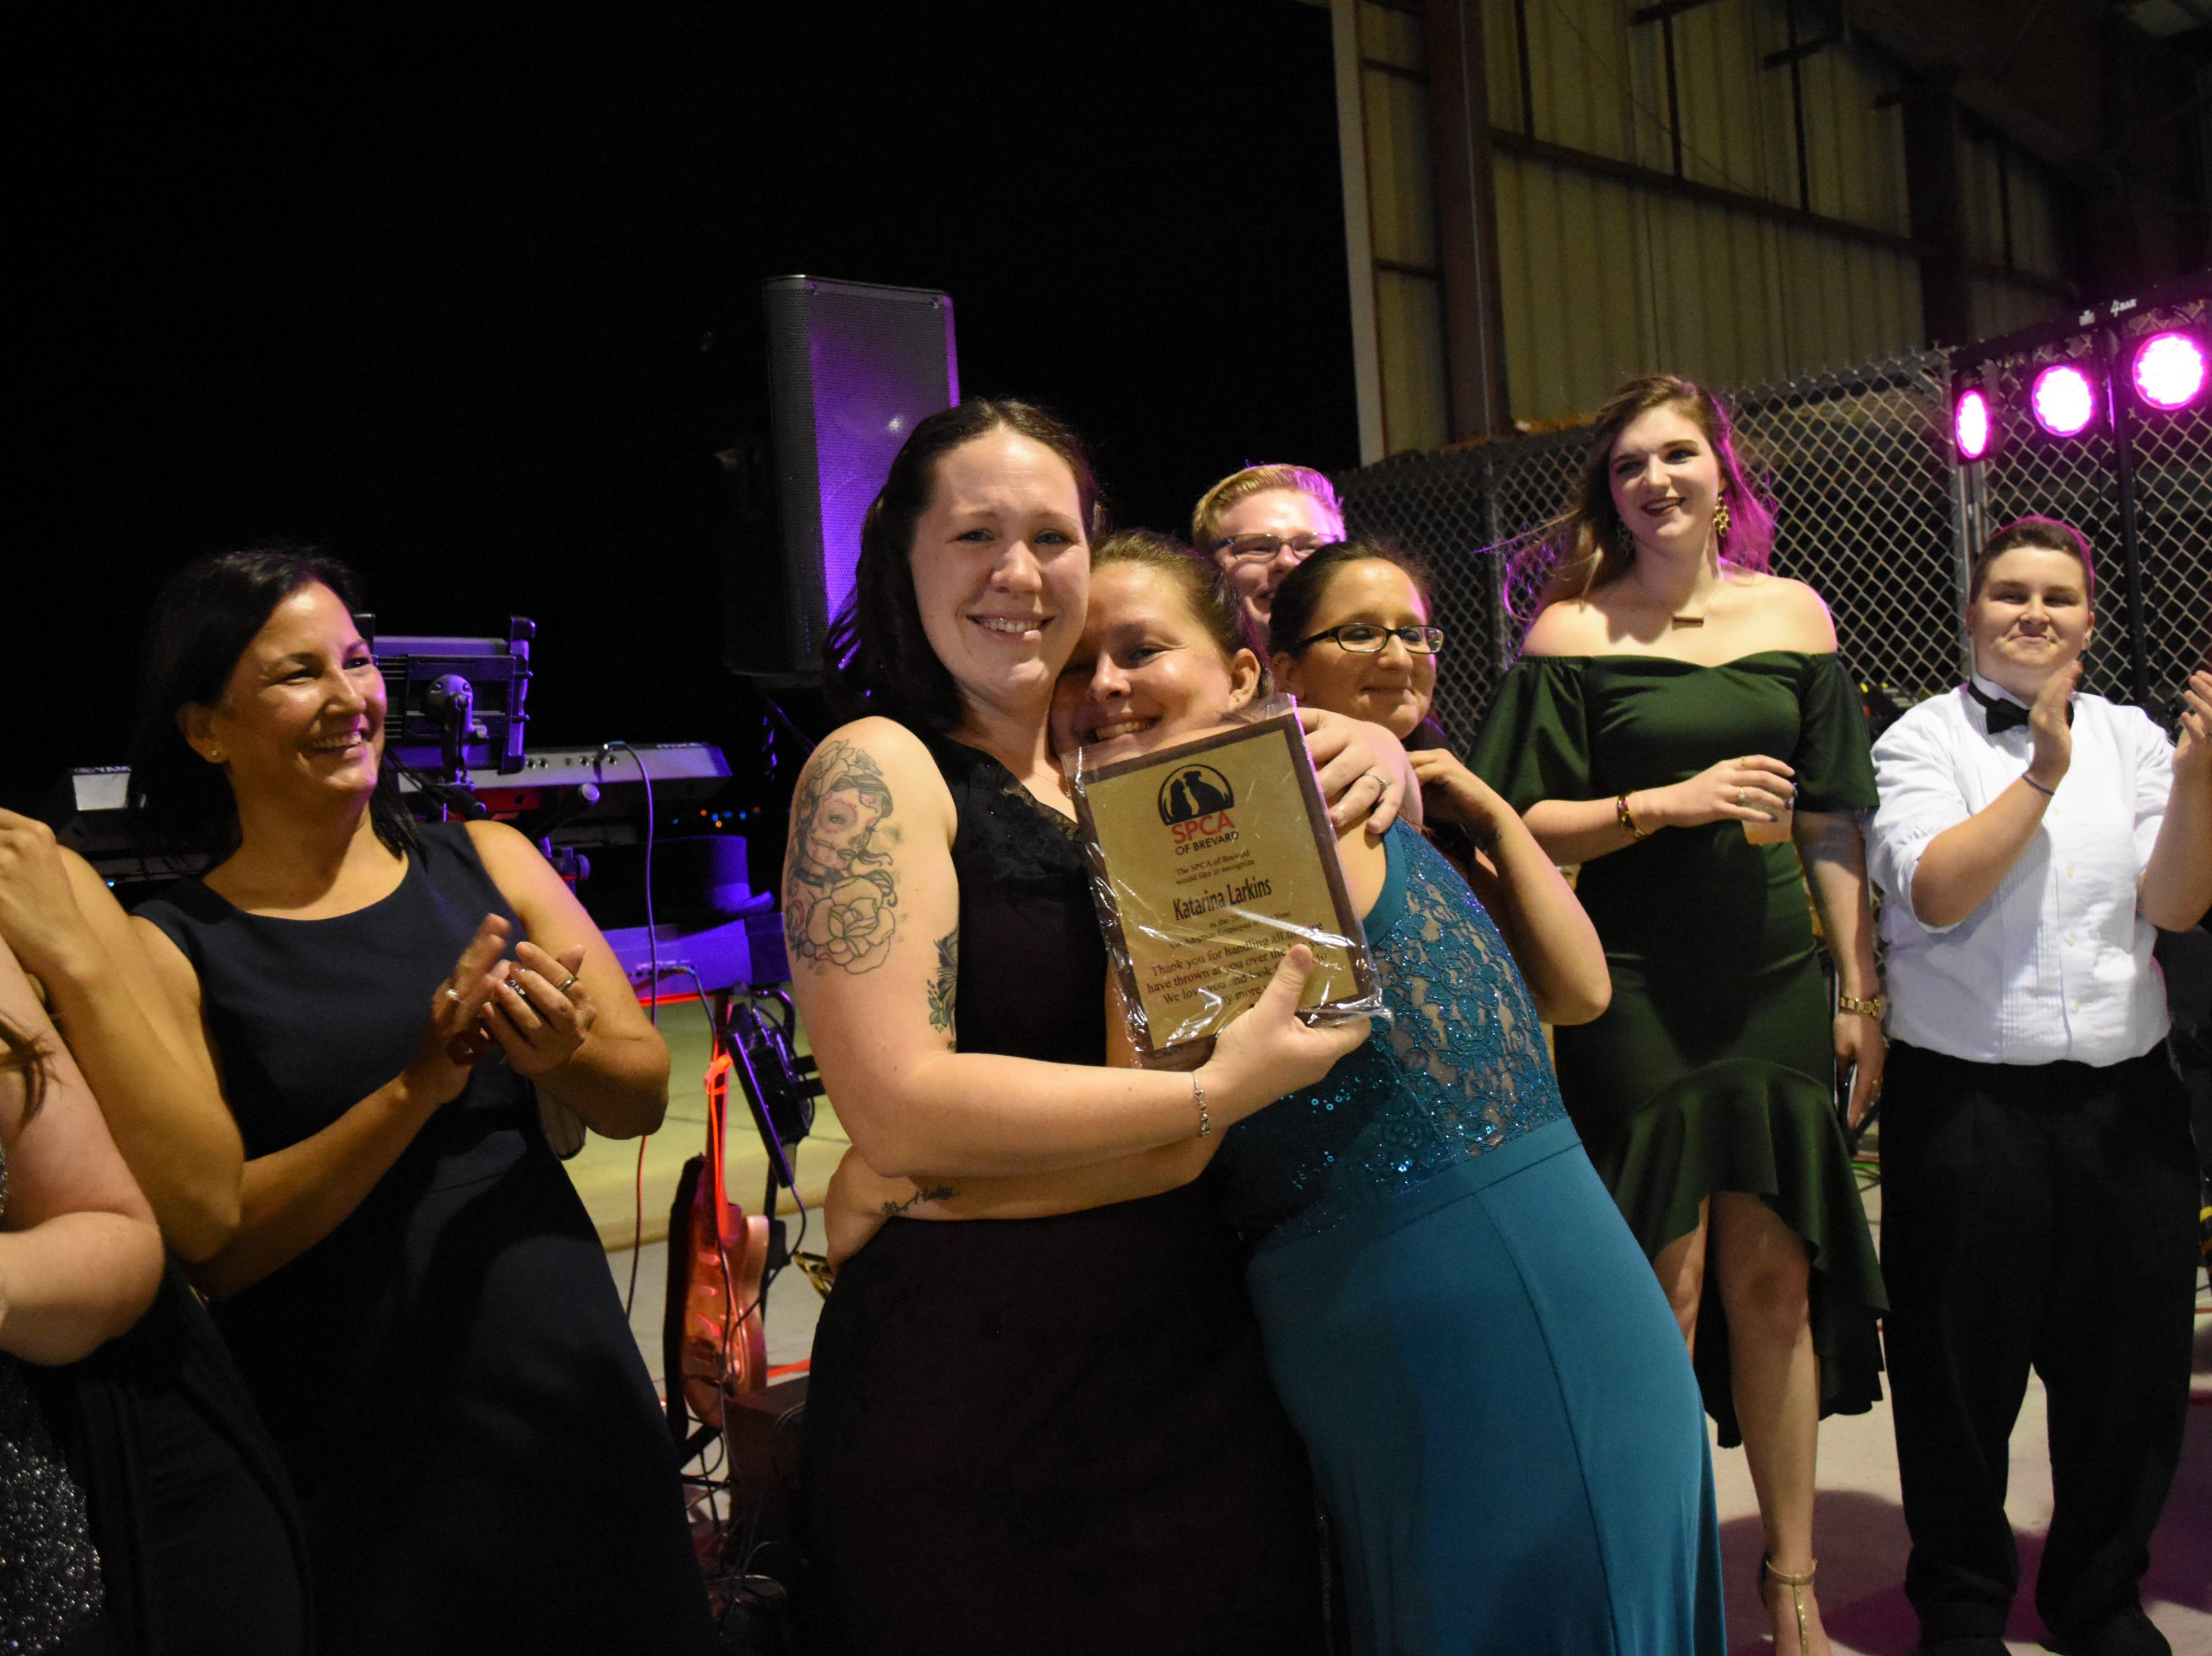 Katrina Larkins is awarded the cat adoption employee of the year award.